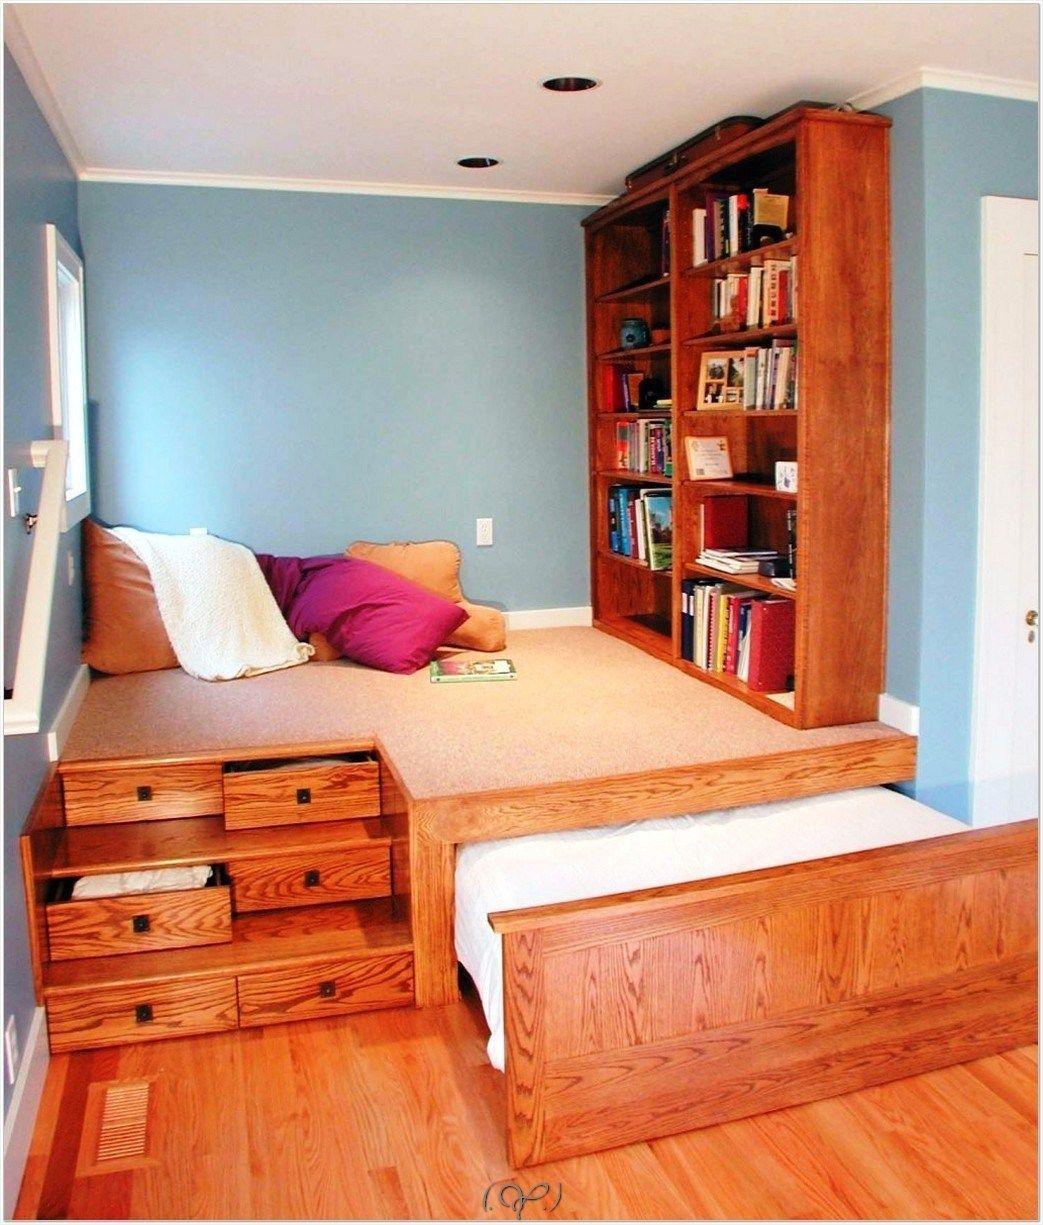 Loft bed ideas diy   Perfect Girls Bedroom Ideas for Small Rooms  Interior Design